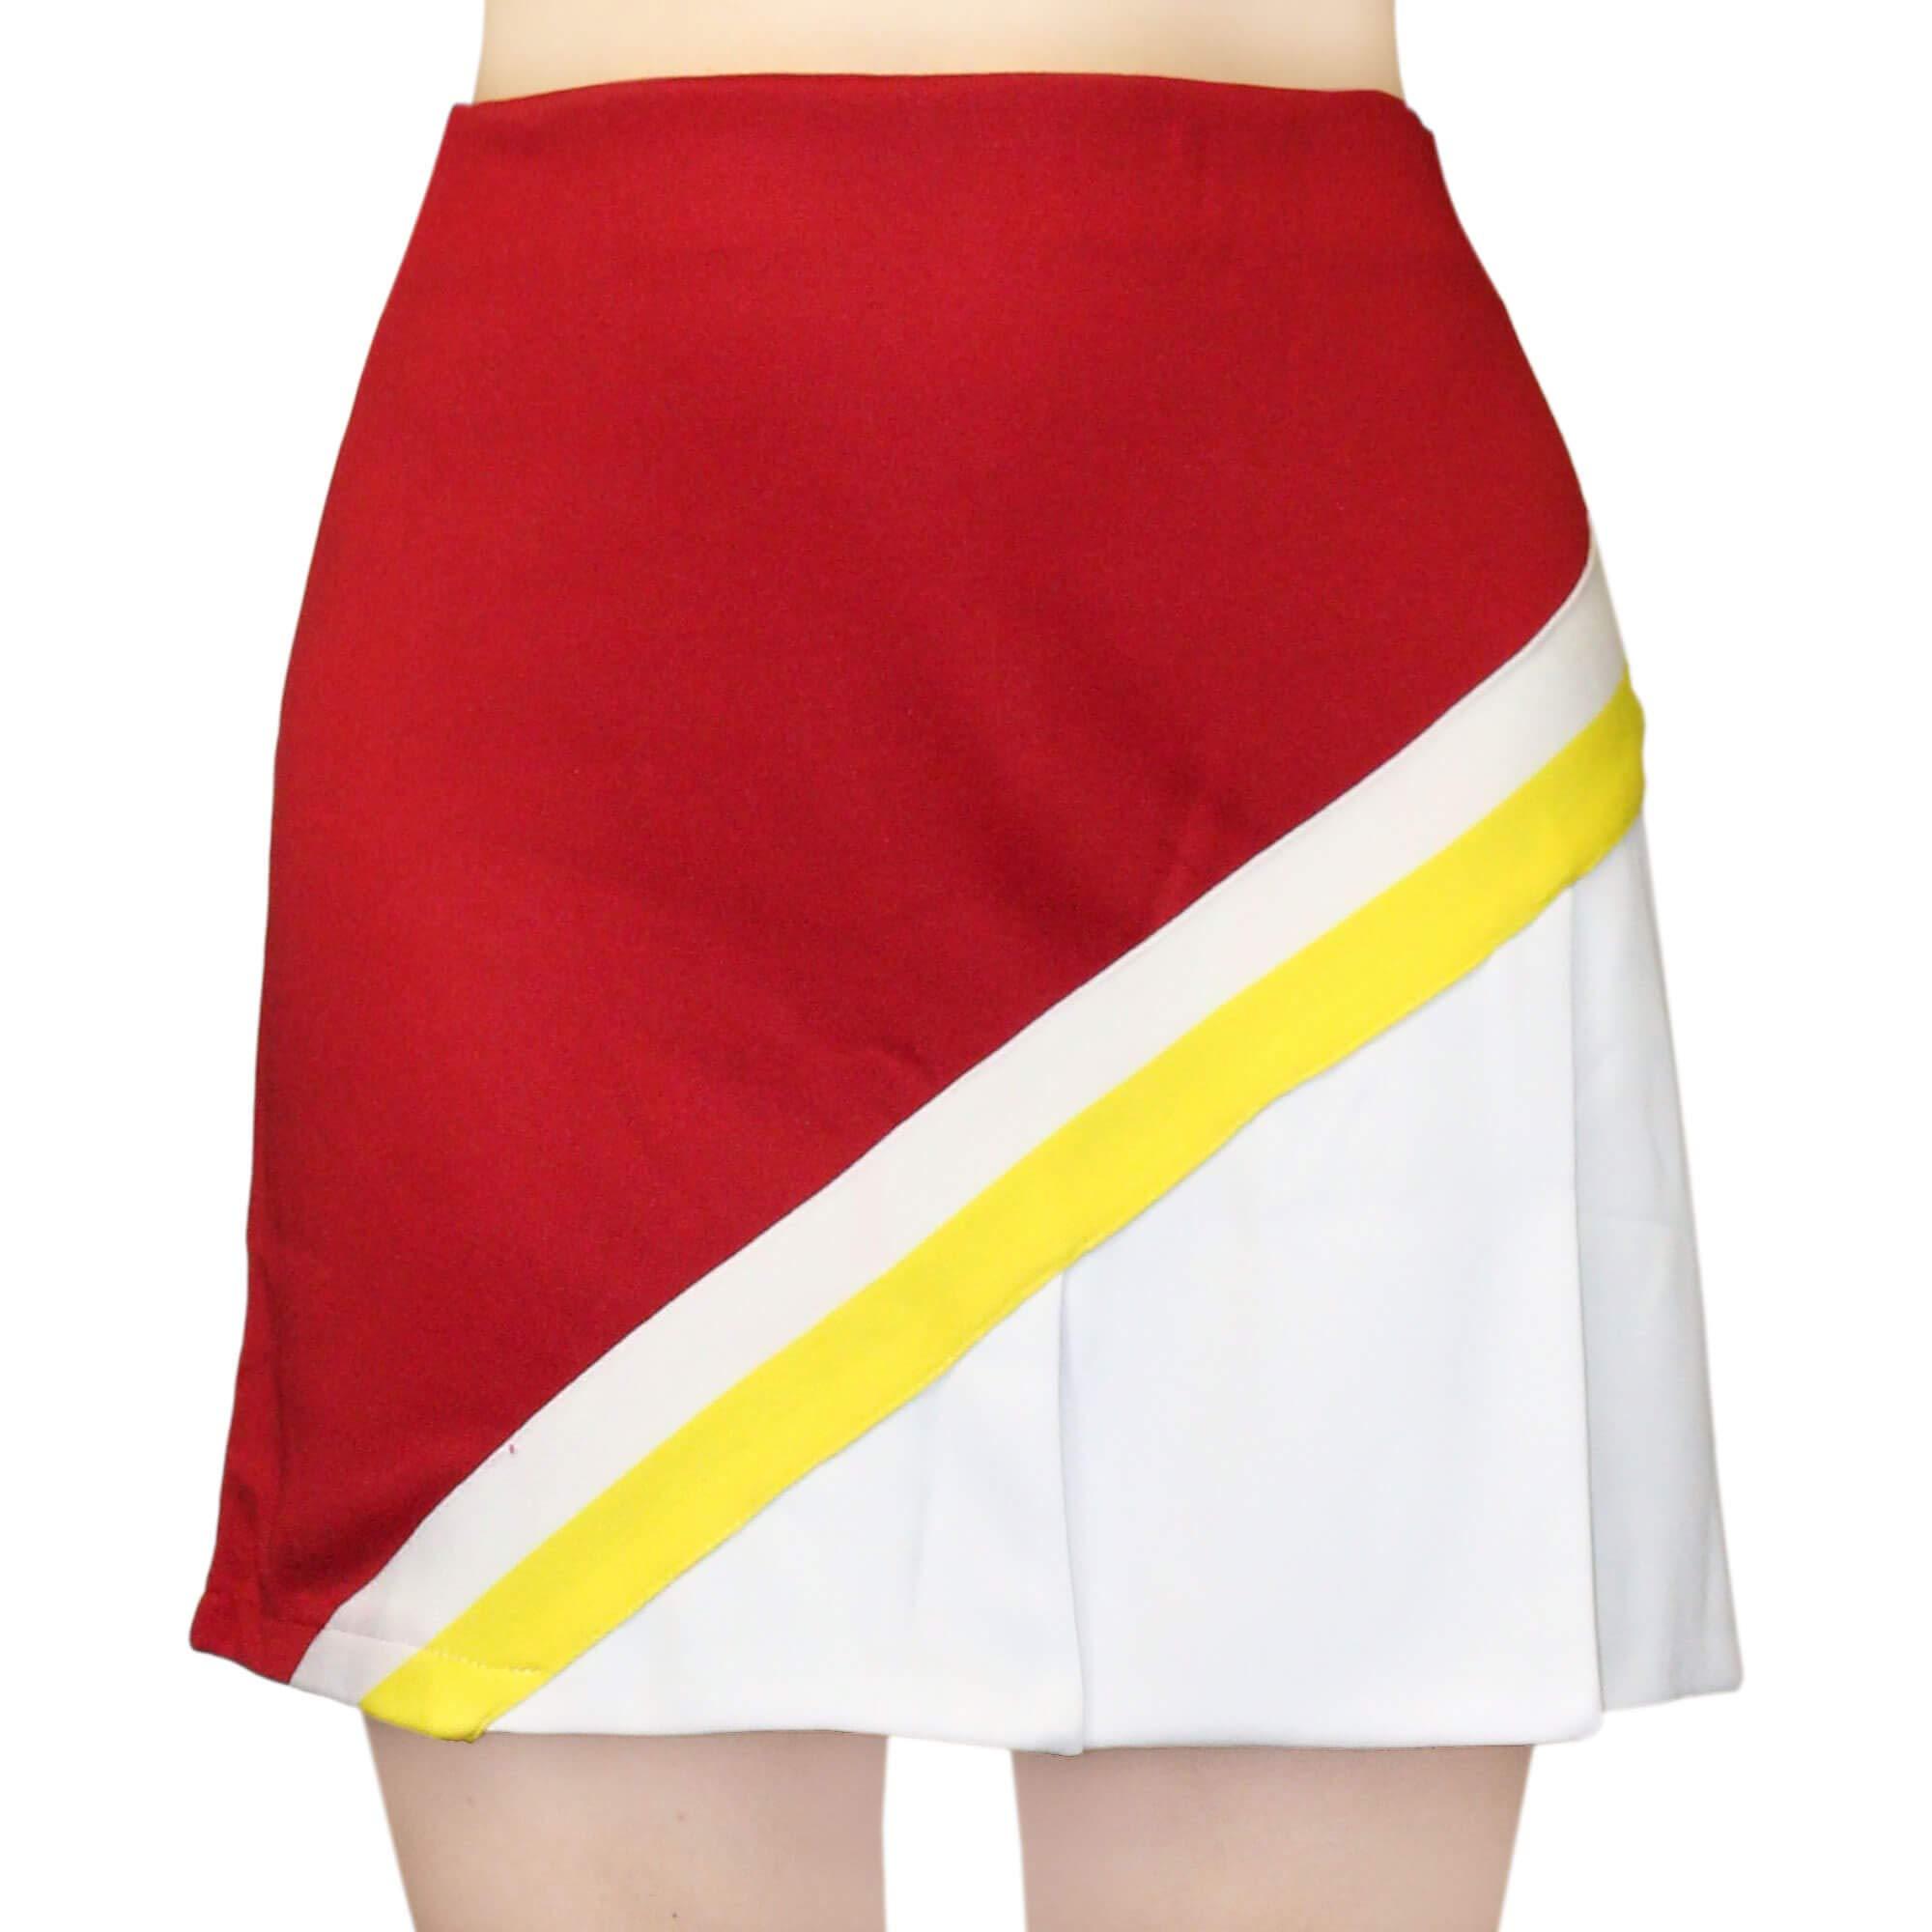 Danzcue Adult Cheerleading A-Line Pleat Skirt, Scarlet-White, Medium by Danzcue